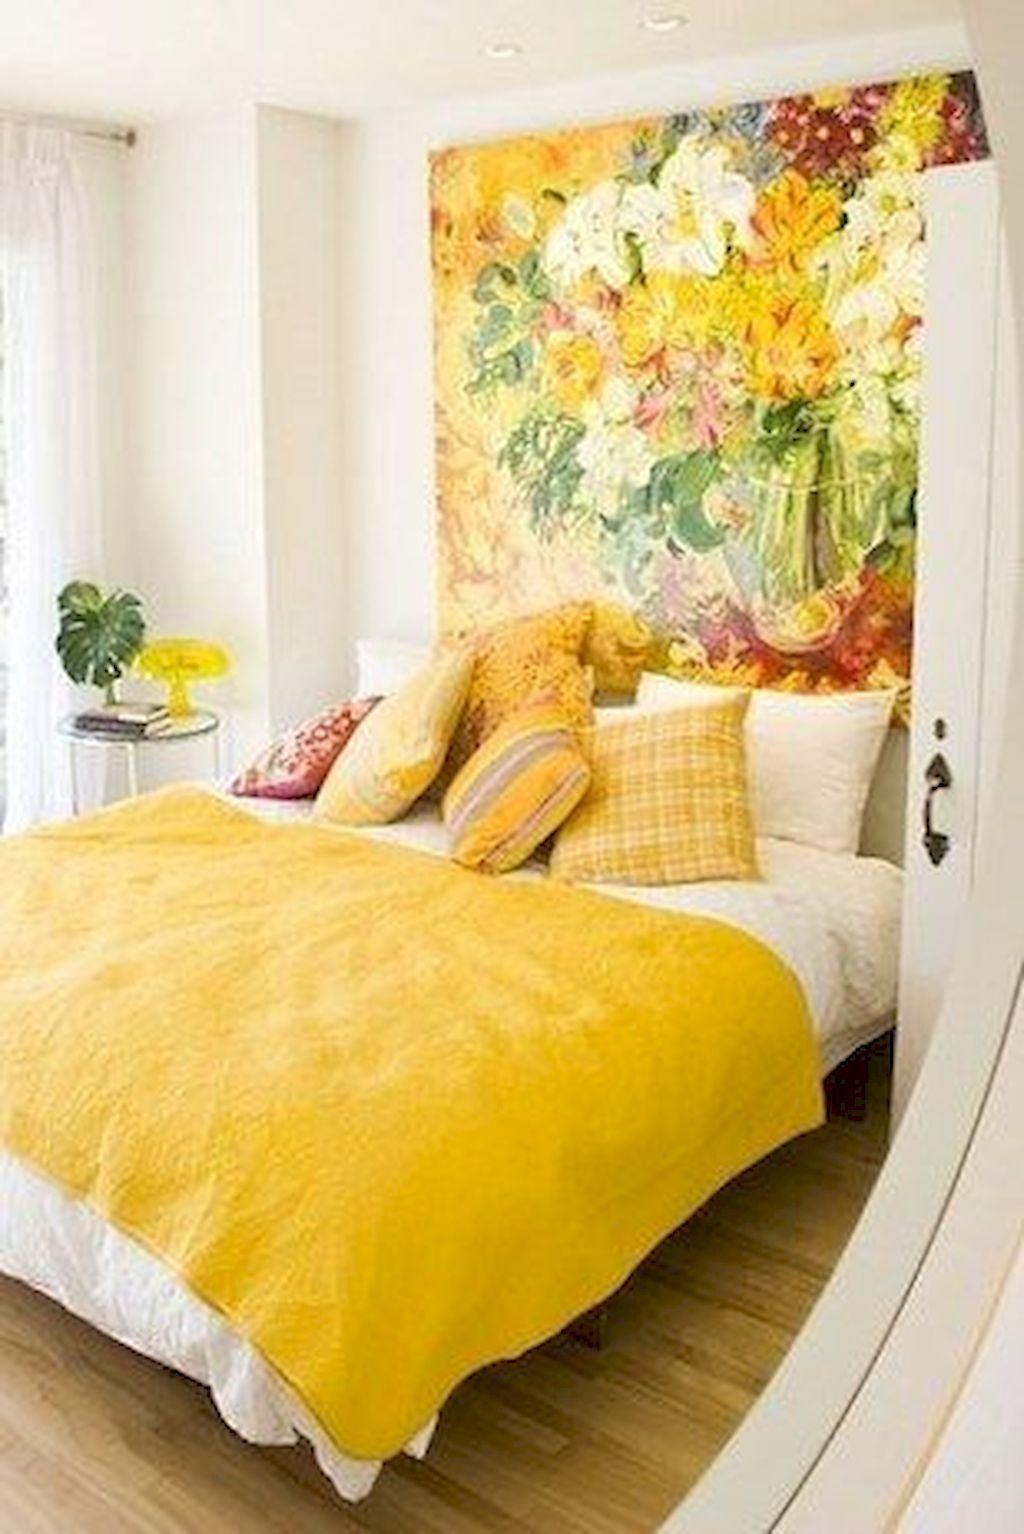 Master bedroom headboard ideas   Cool Small Master Bedroom Design u Decor Ideas  Small master